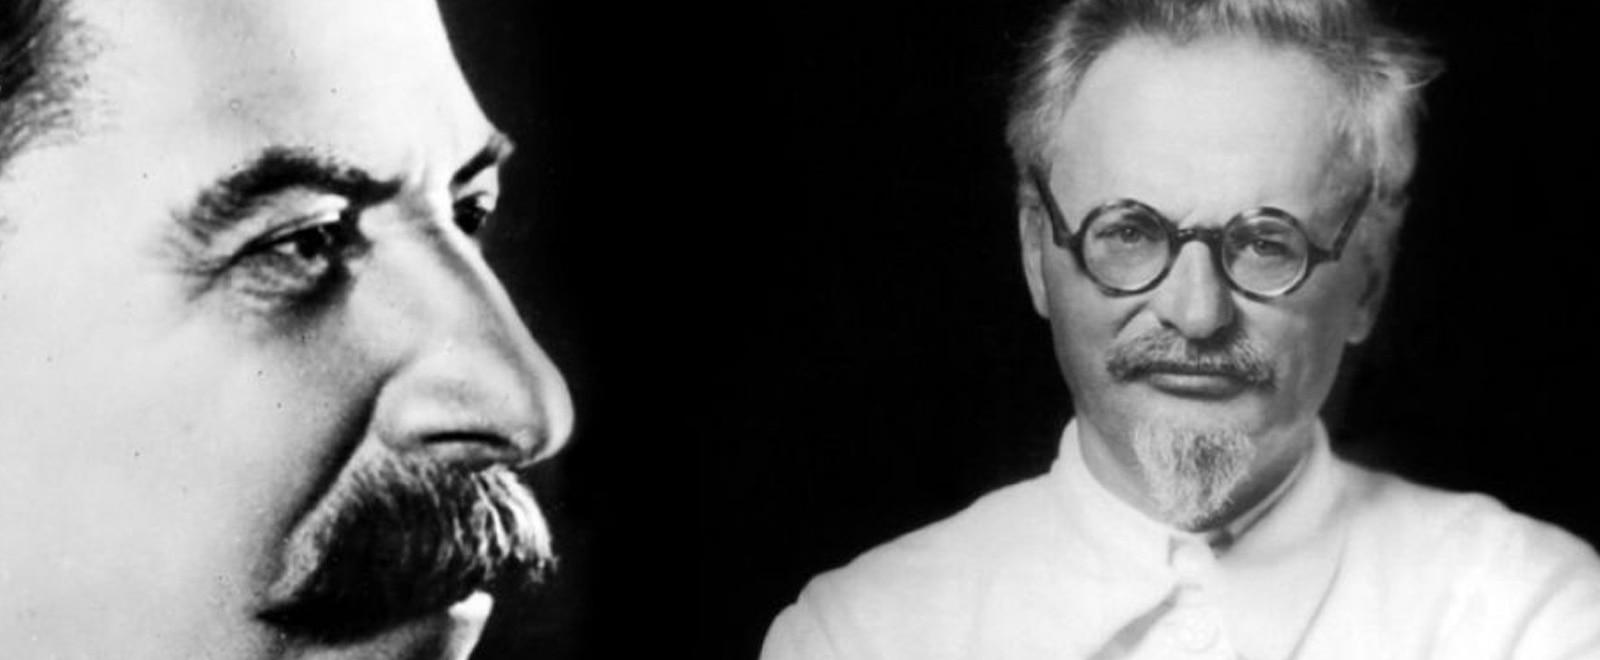 Stalin - Trotsky: duello mortale